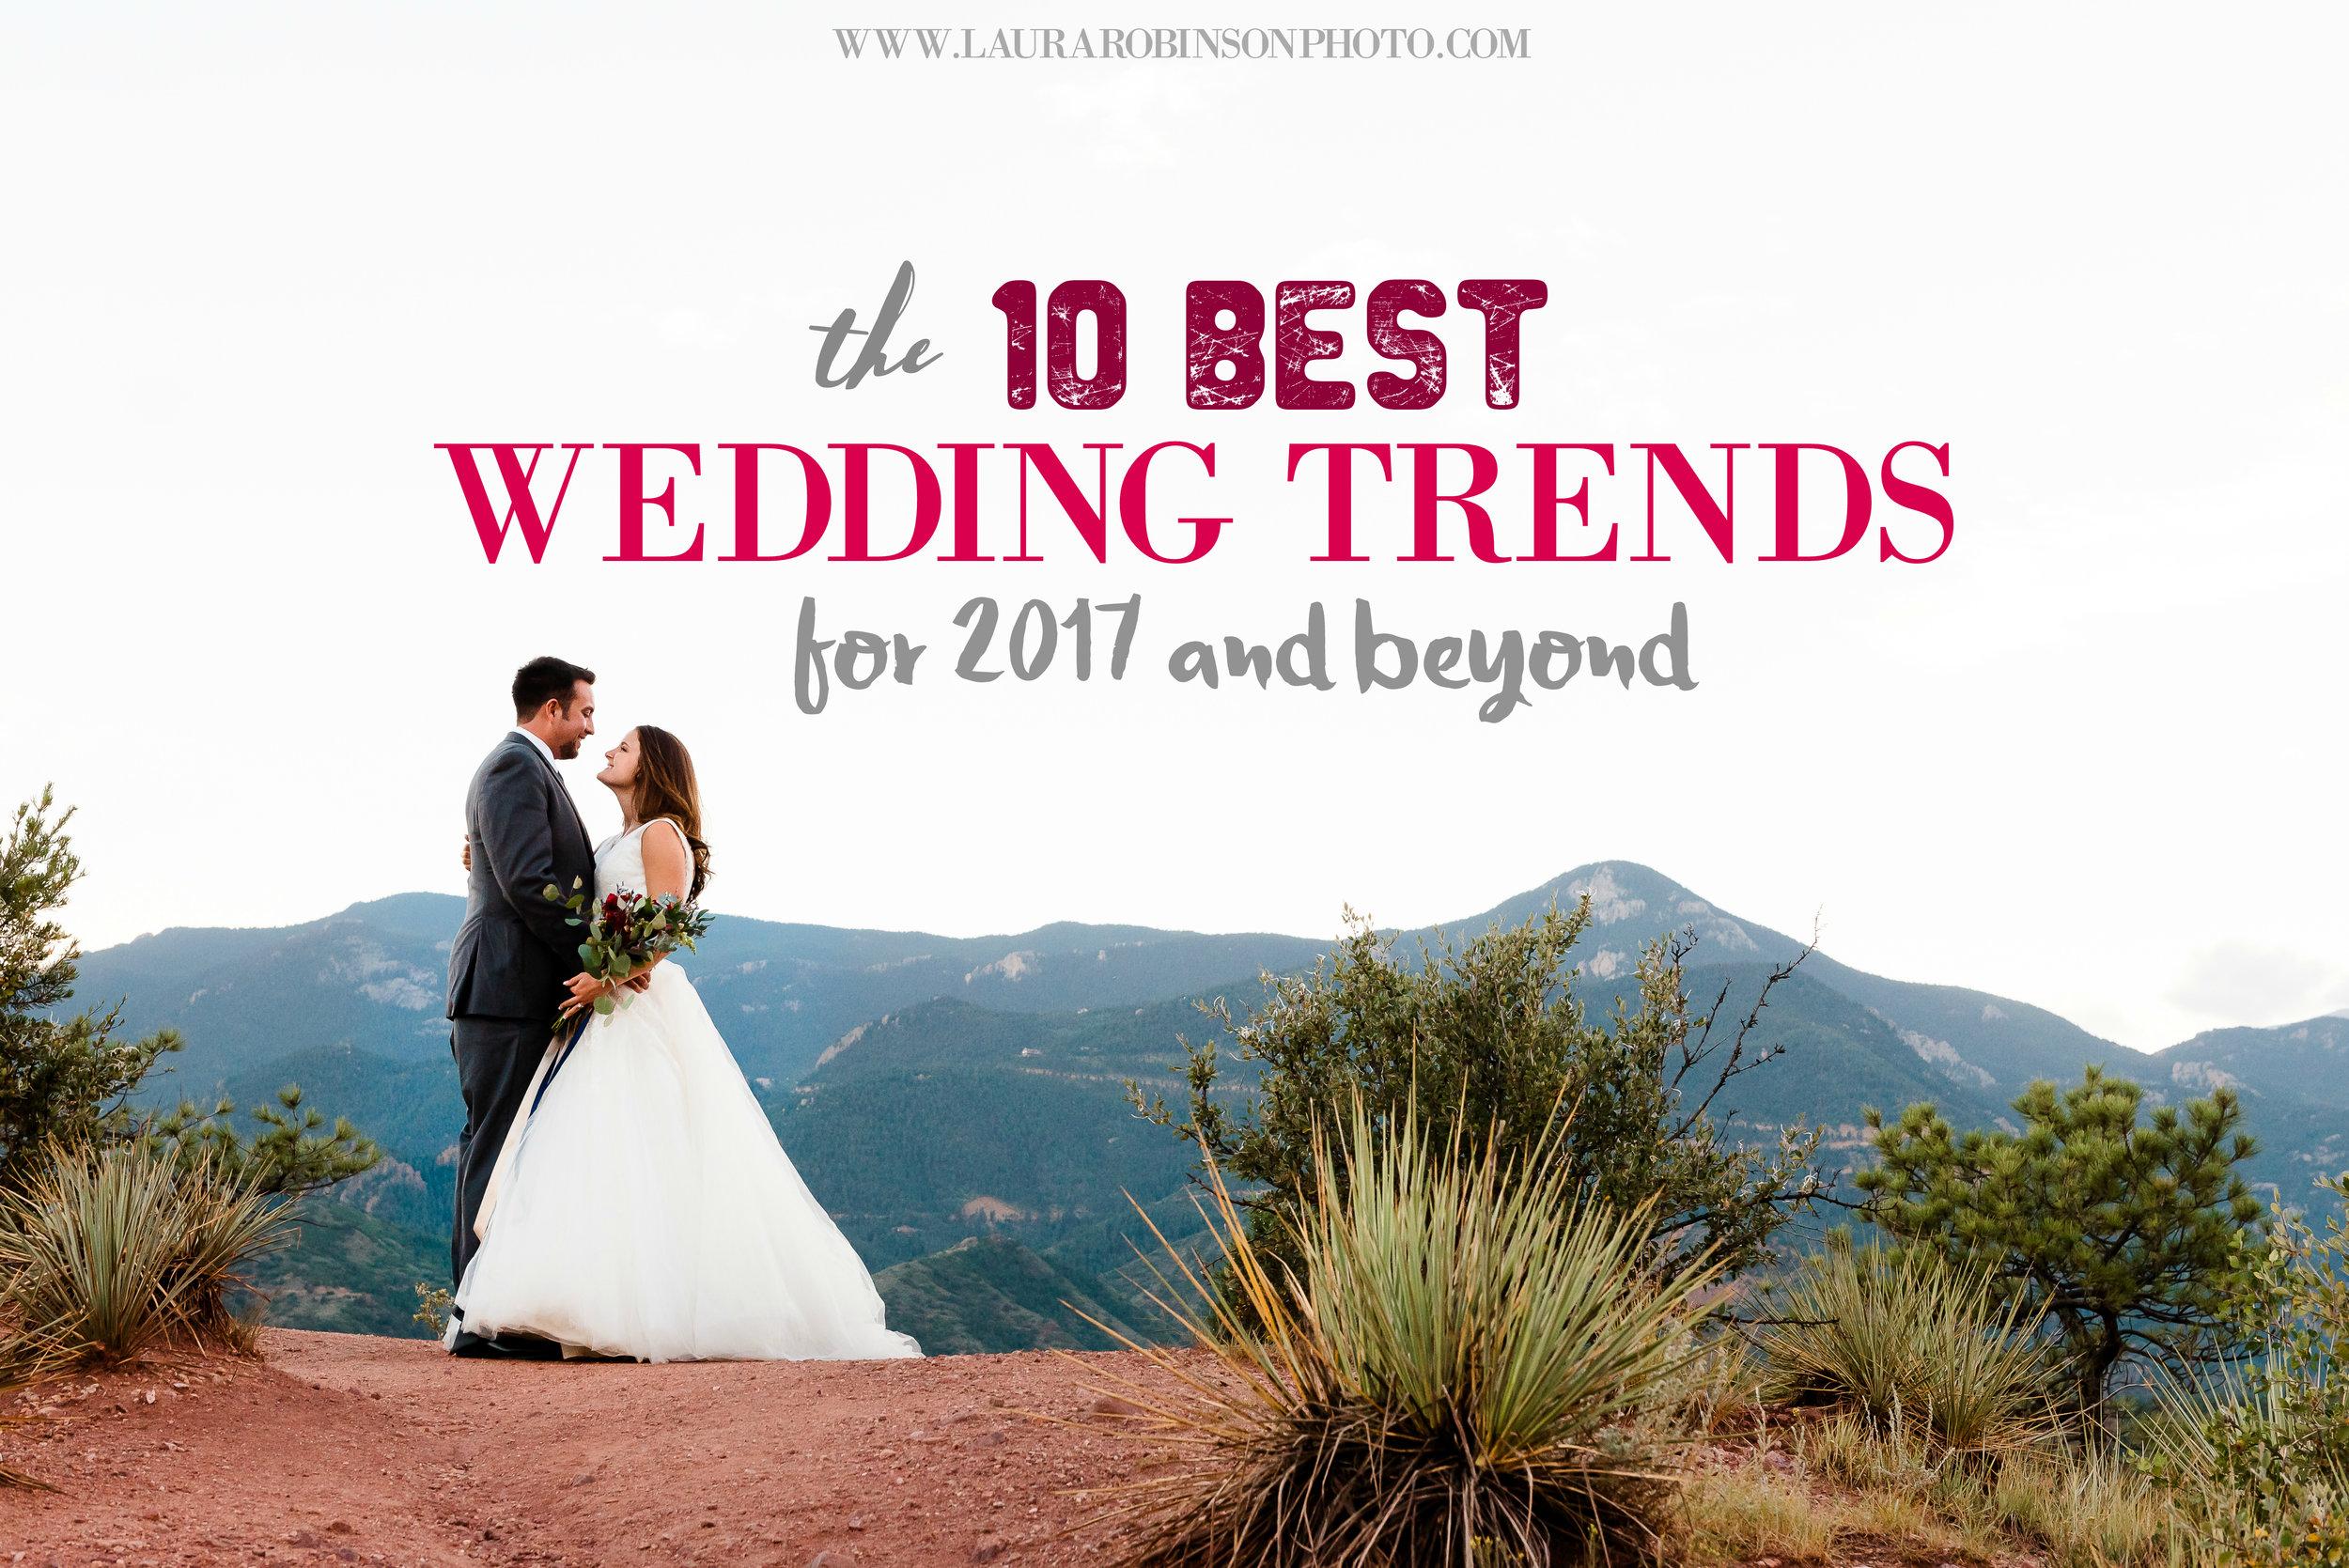 WEDDING TRENDS FOR 2017 - TOP WEDDING PLANNING INSPIRATION IDEAS